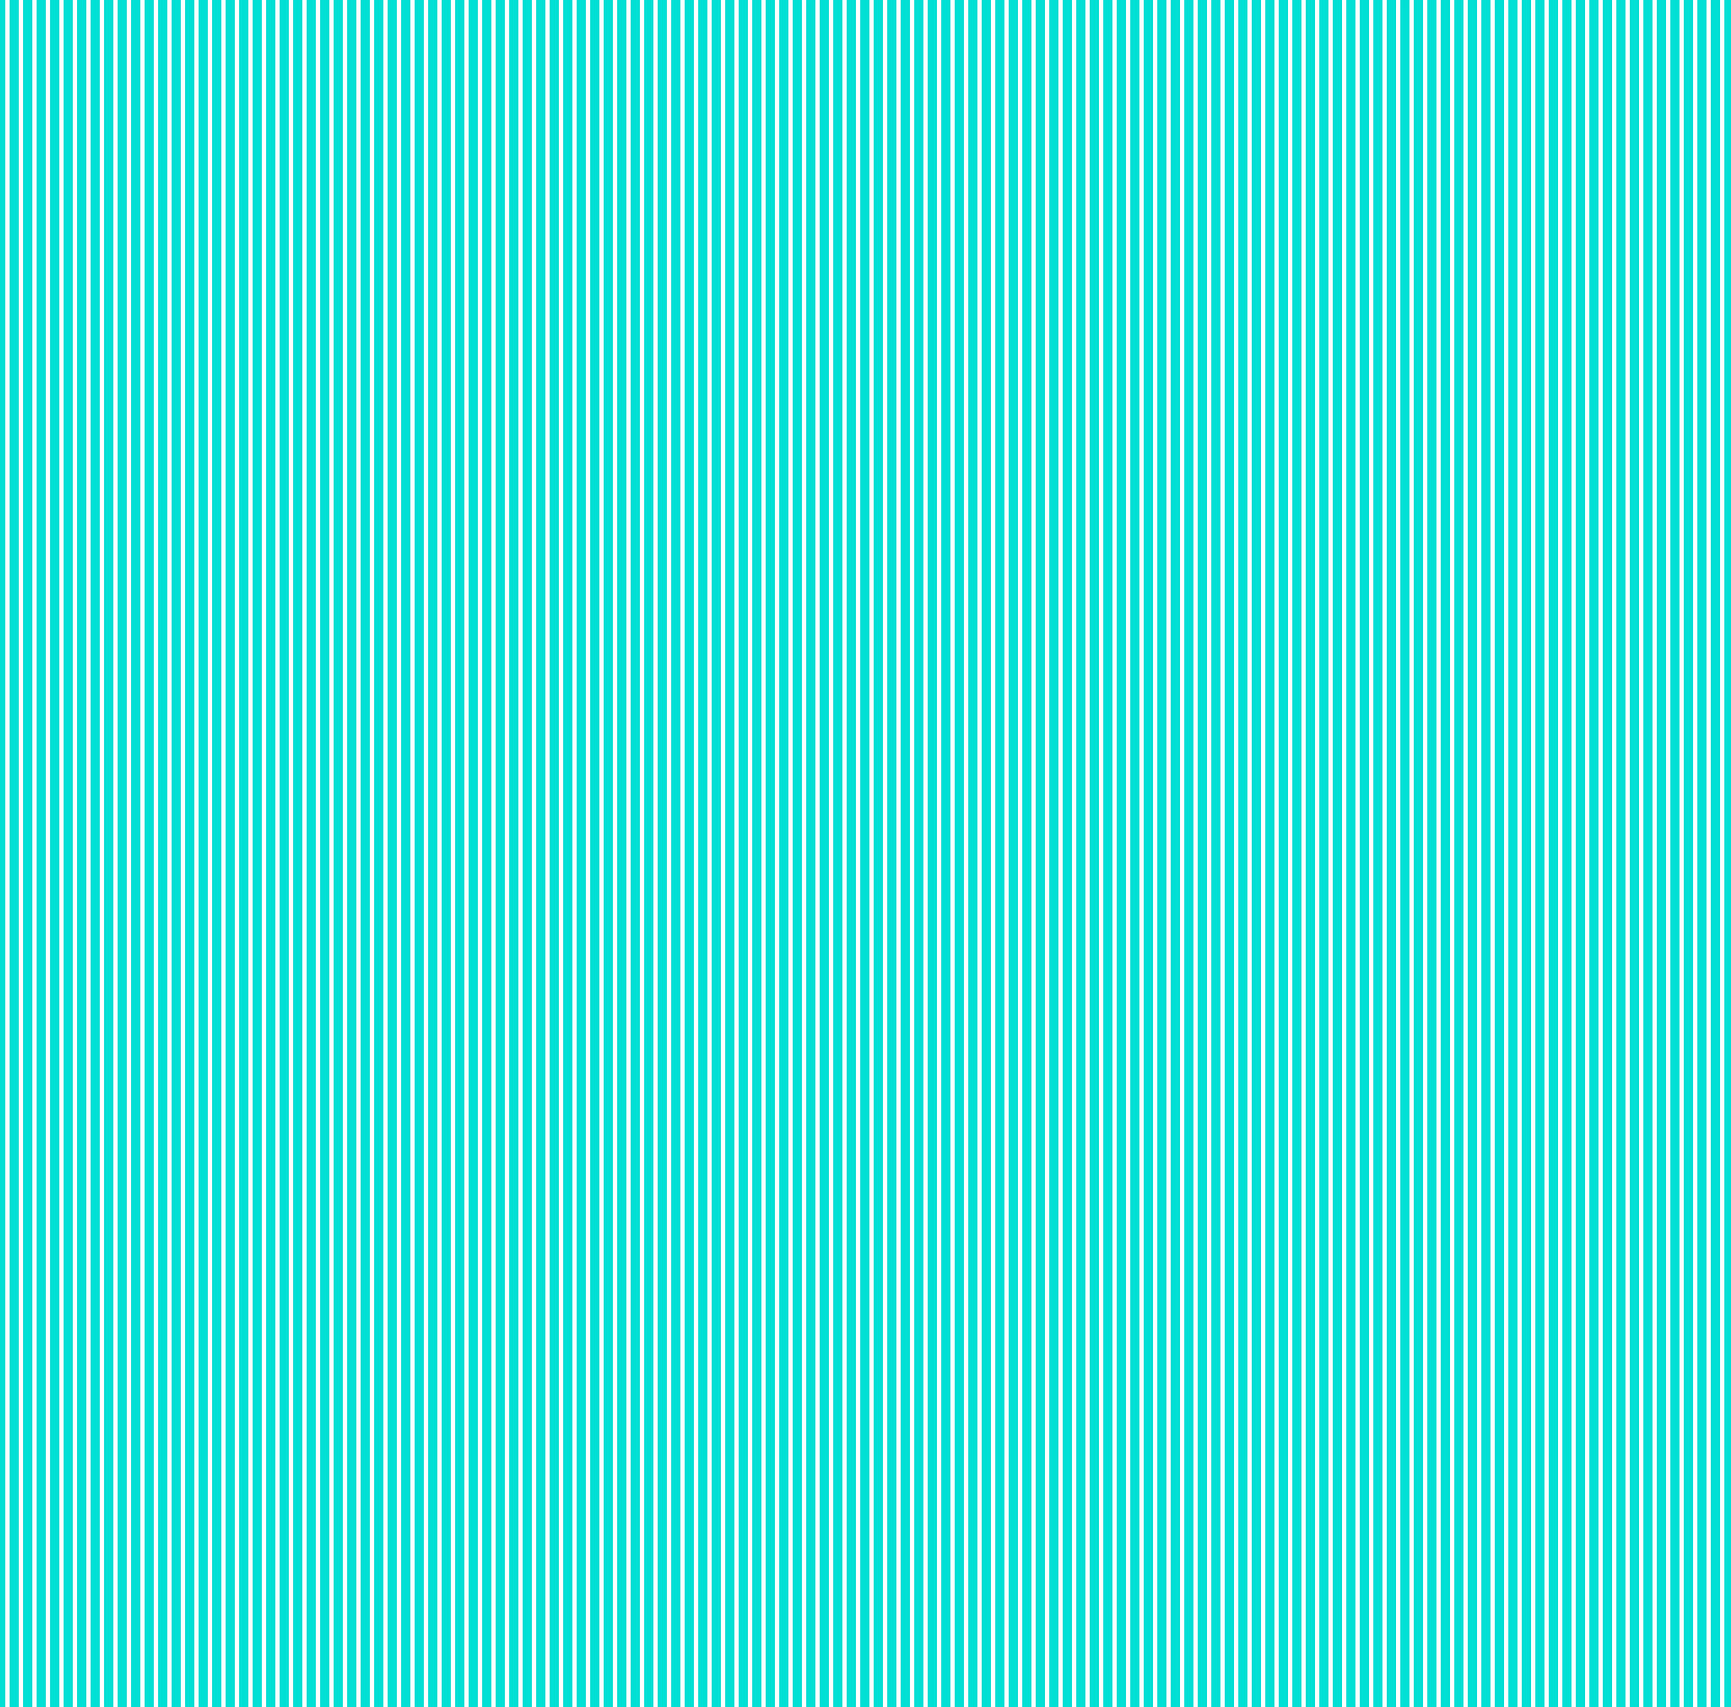 Teal Opulence Pinstripe Wallpaper.jpg